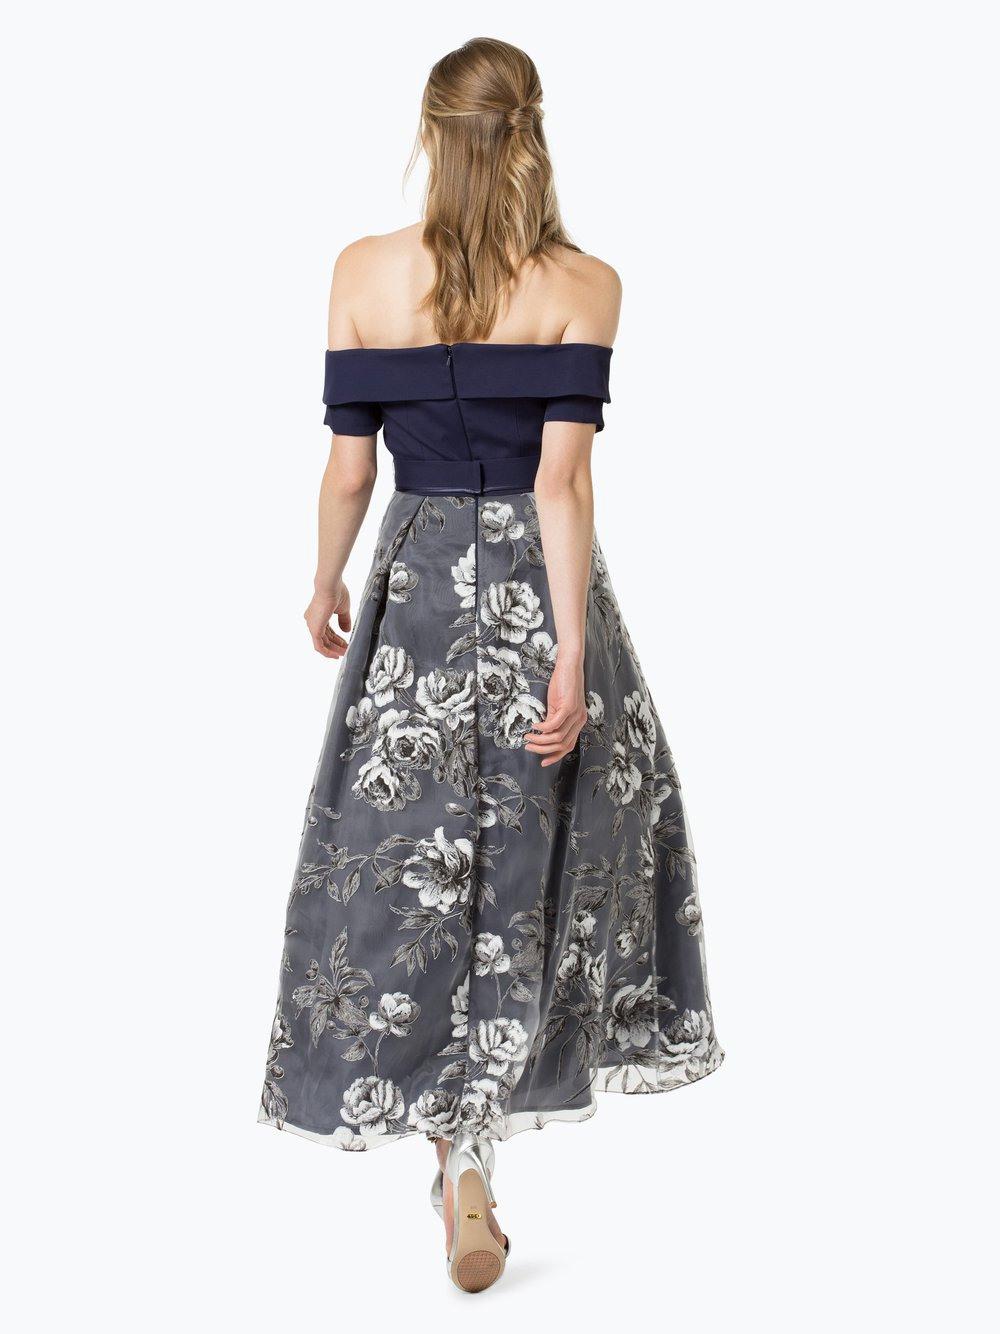 10 Luxus Coast Abendkleid Spezialgebiet20 Cool Coast Abendkleid Vertrieb